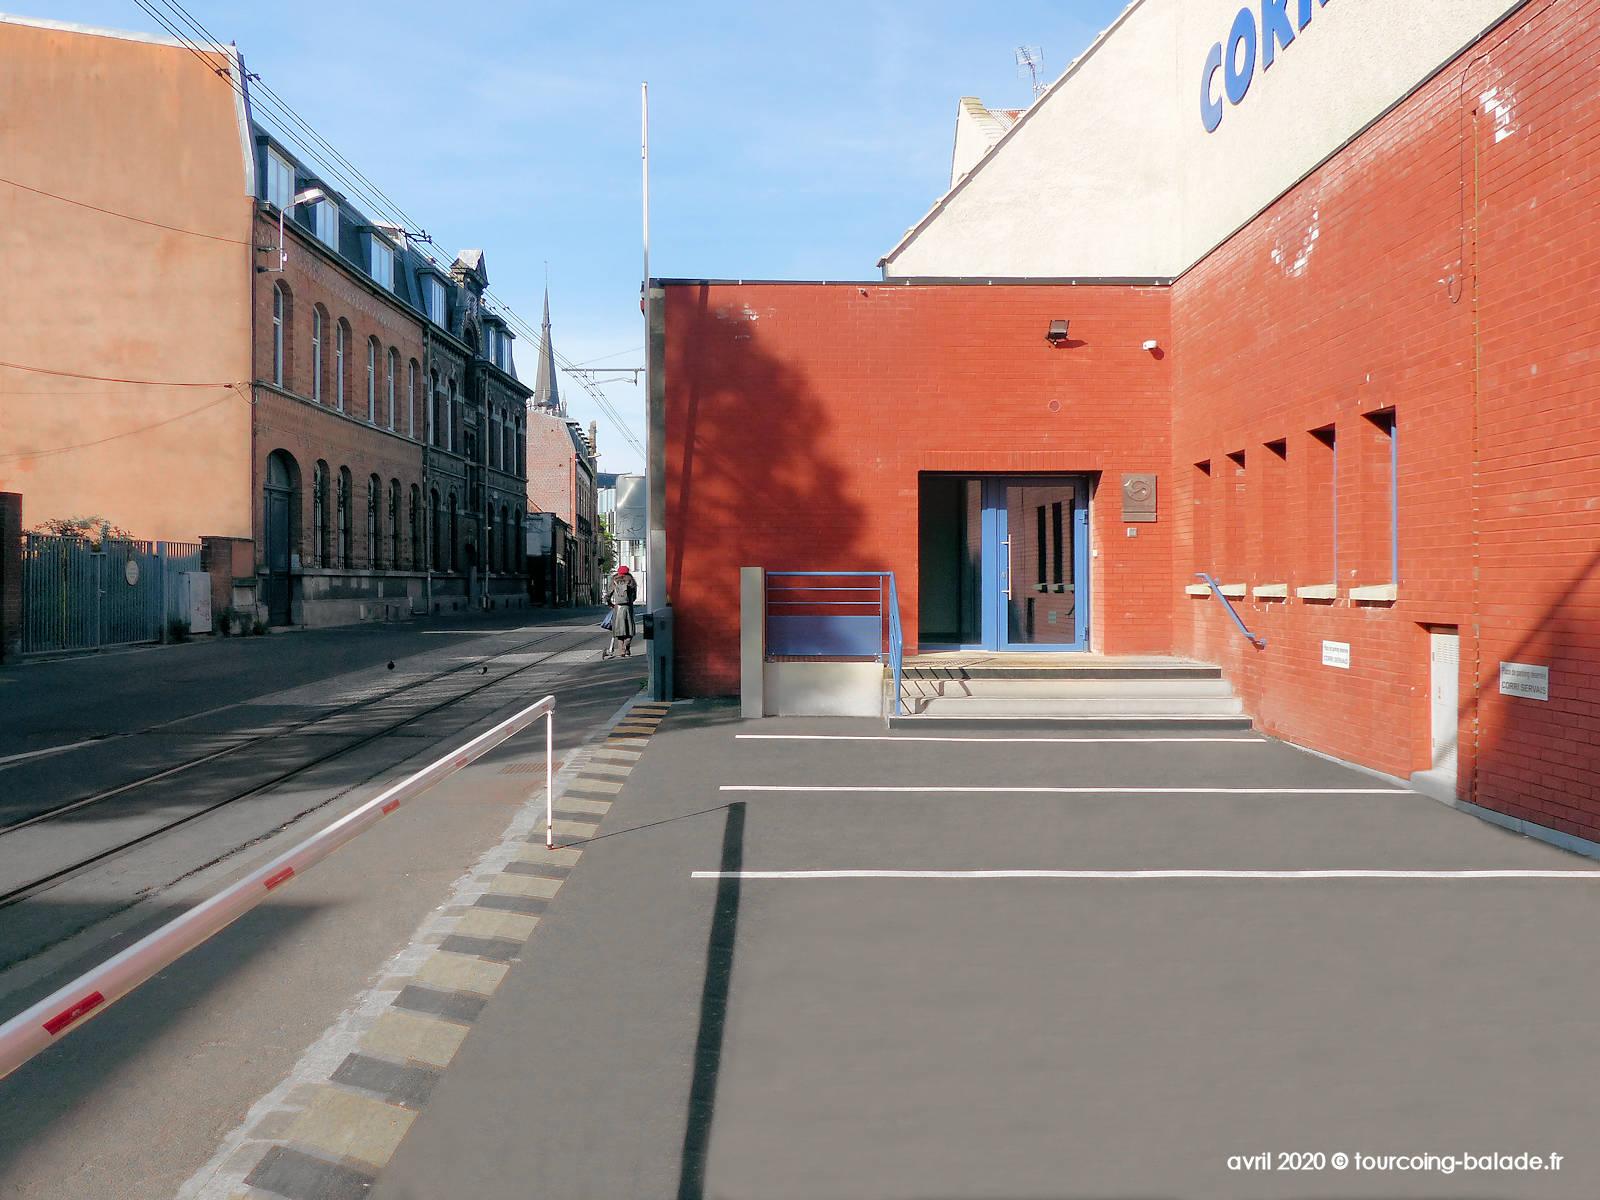 Ateliers des Frères Servais, Tourcoing 2020